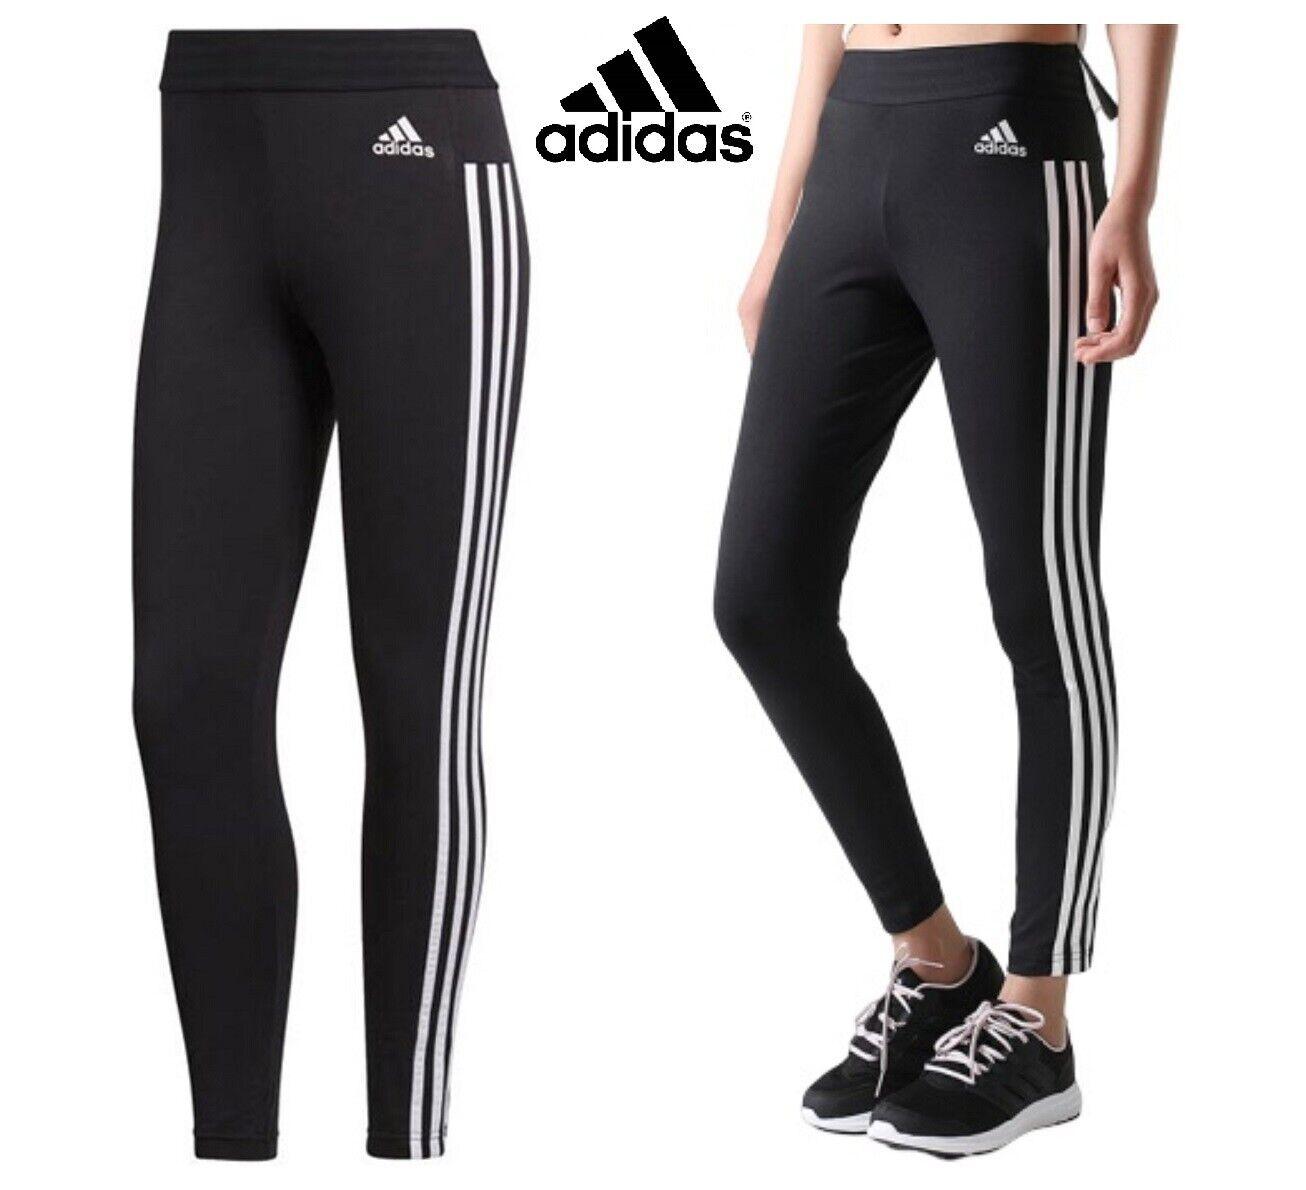 adidas leggings gym